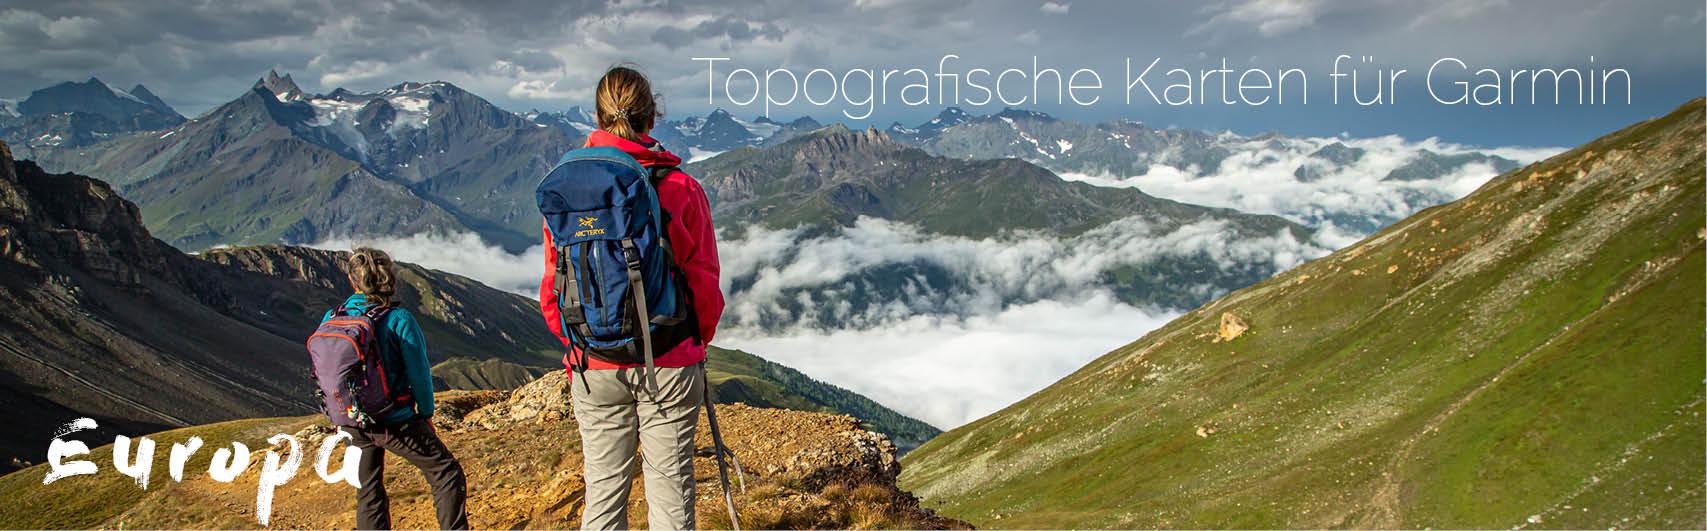 topo-karten-garmin-europa-navitracksGrmHrDTMLJcYd